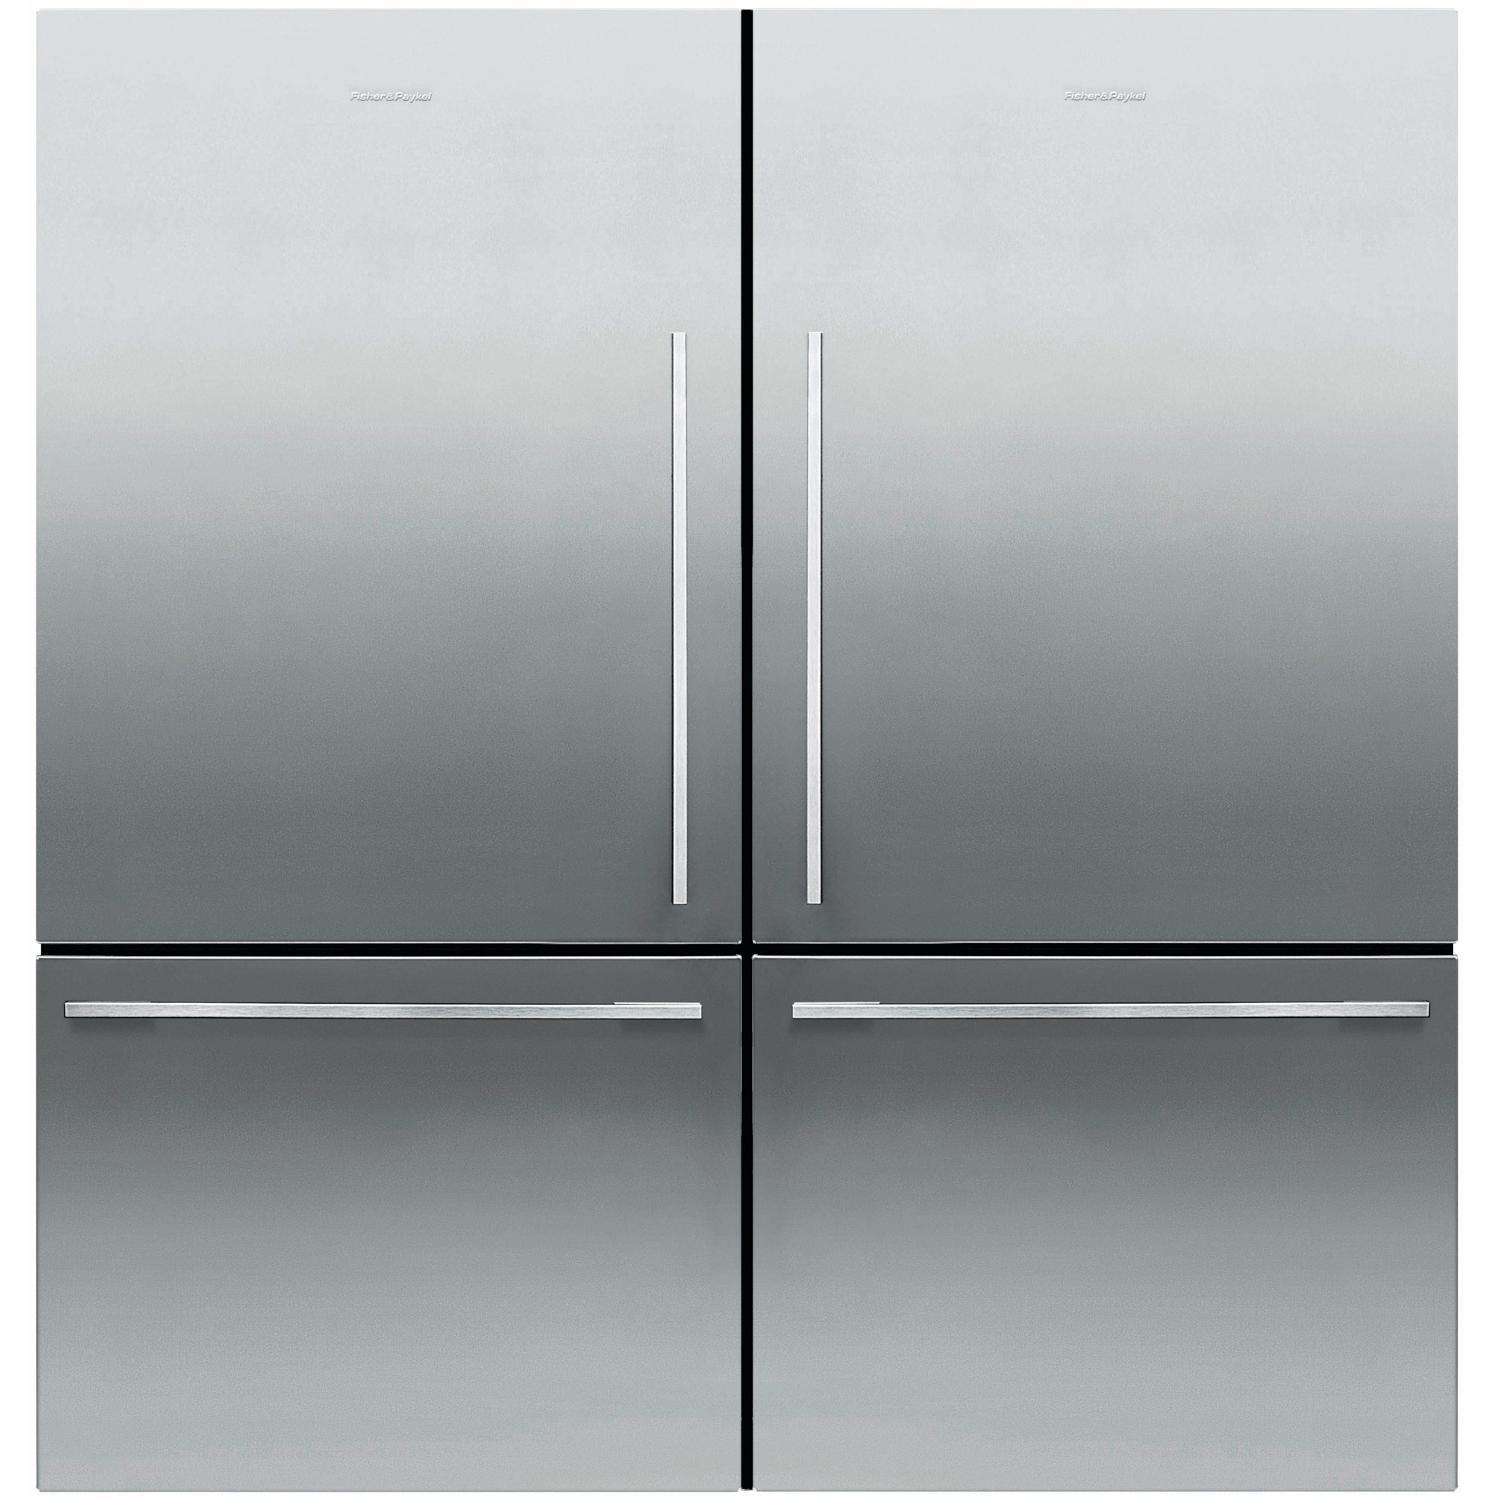 Fisher Paykel 64 Inch Wide Dual Bottom Freezer Counter Depth Refrigerators W Flat Doors Stainless Steel Rf170wdlx5 Rf170wdrx5